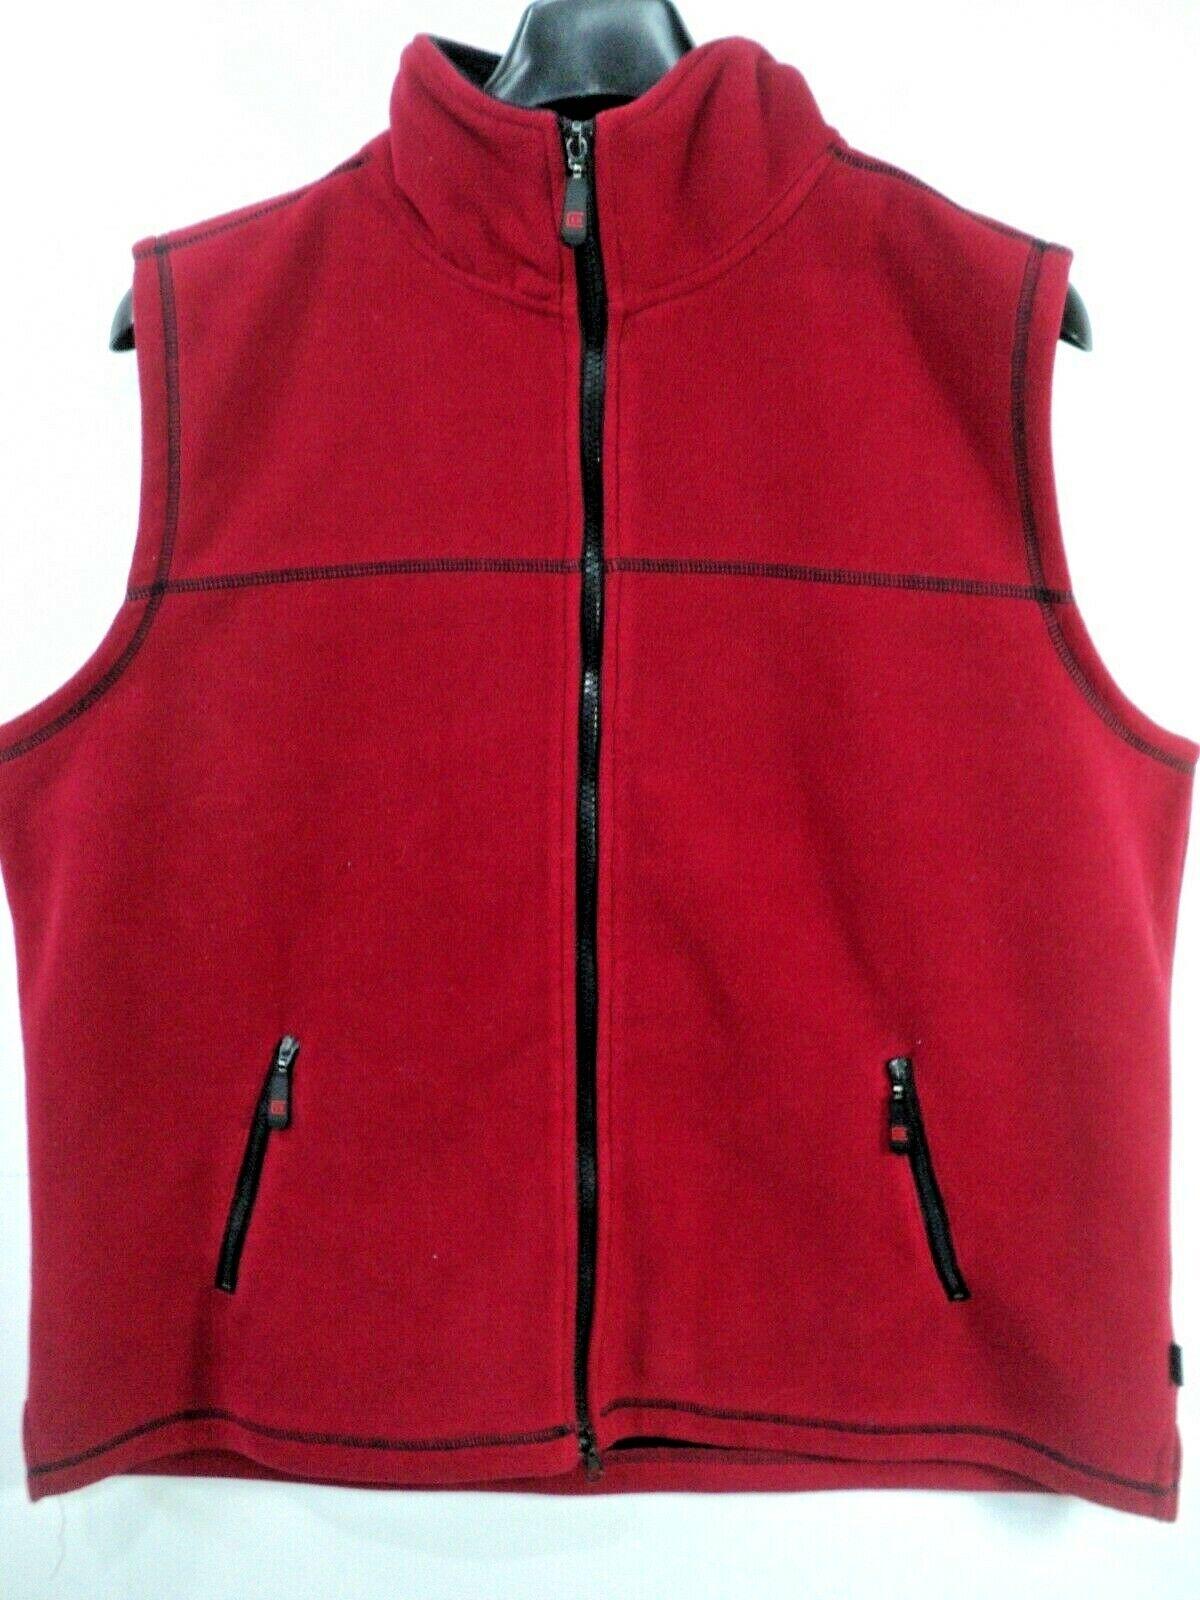 BC Clothing Women Vest Red Polyester Fleece Full Zip Sz XL